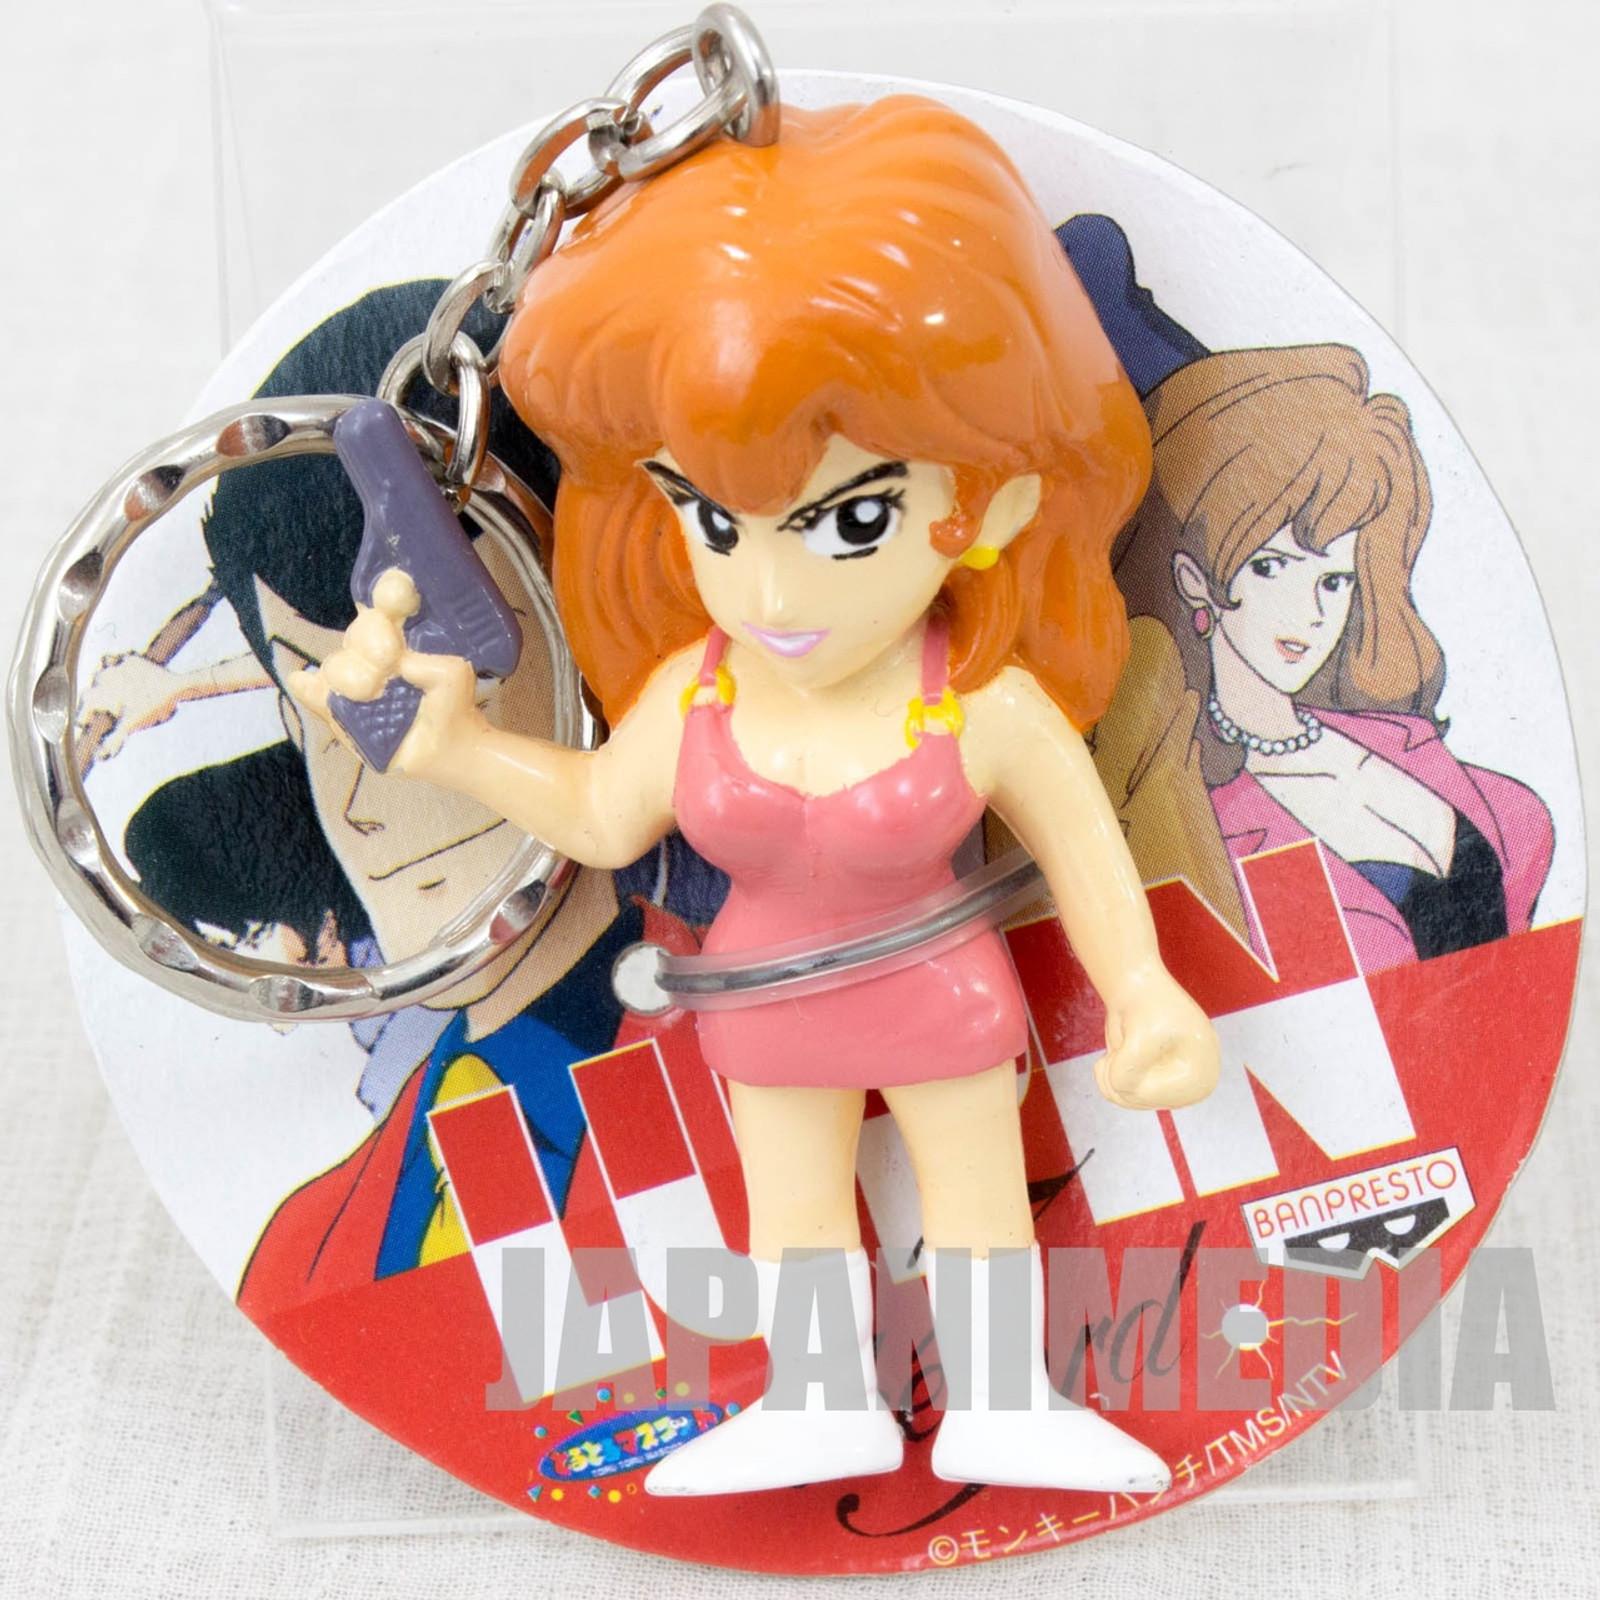 Lupin the Third (3rd) Fujiko Mine Figure Keychain Banpresto JAPAN ANIME MANGA